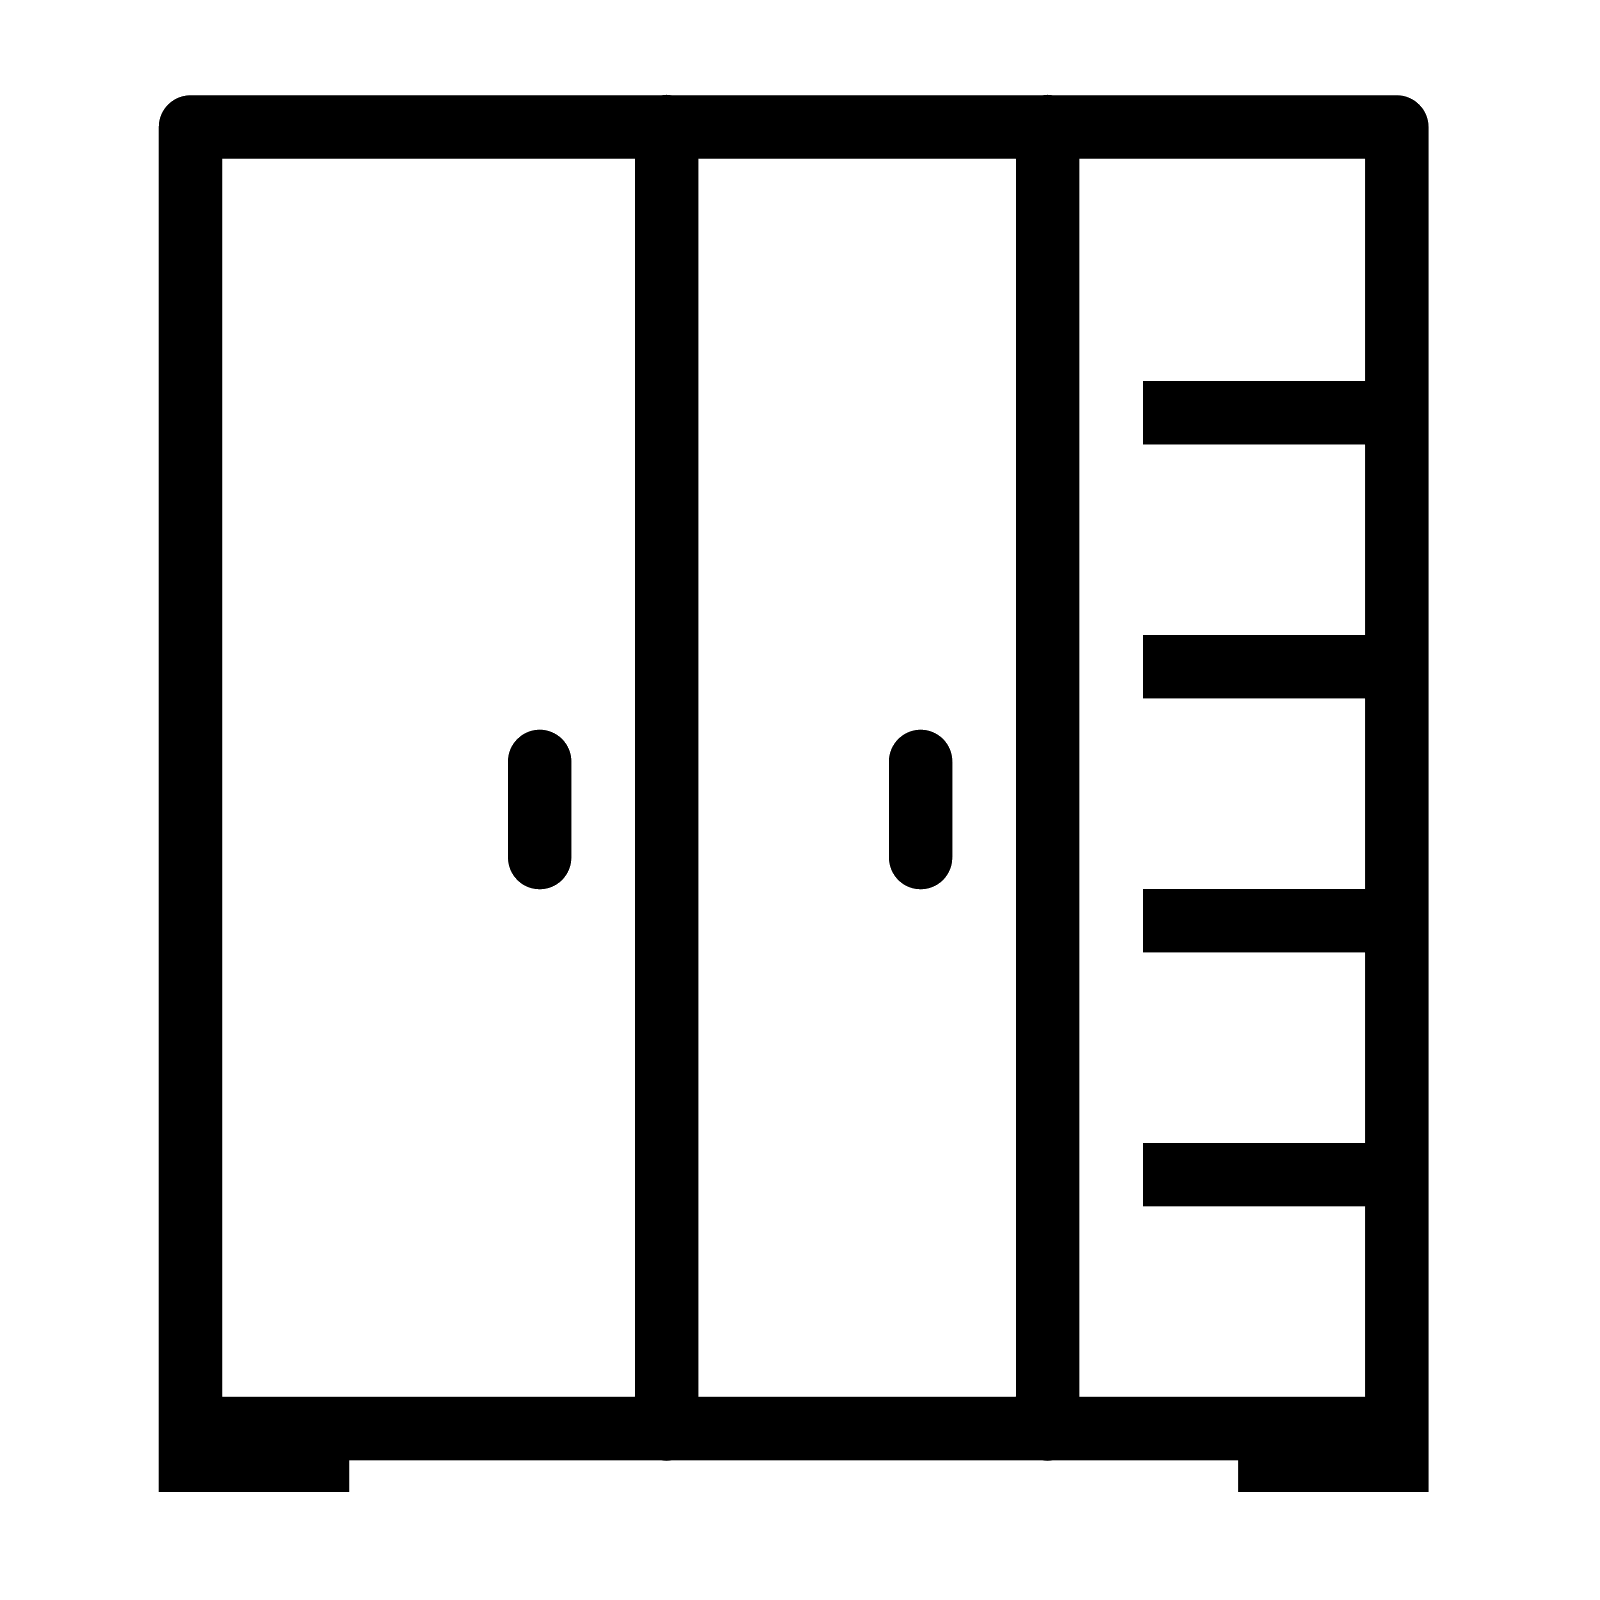 1600x1600 Sliding Door Closet Icon